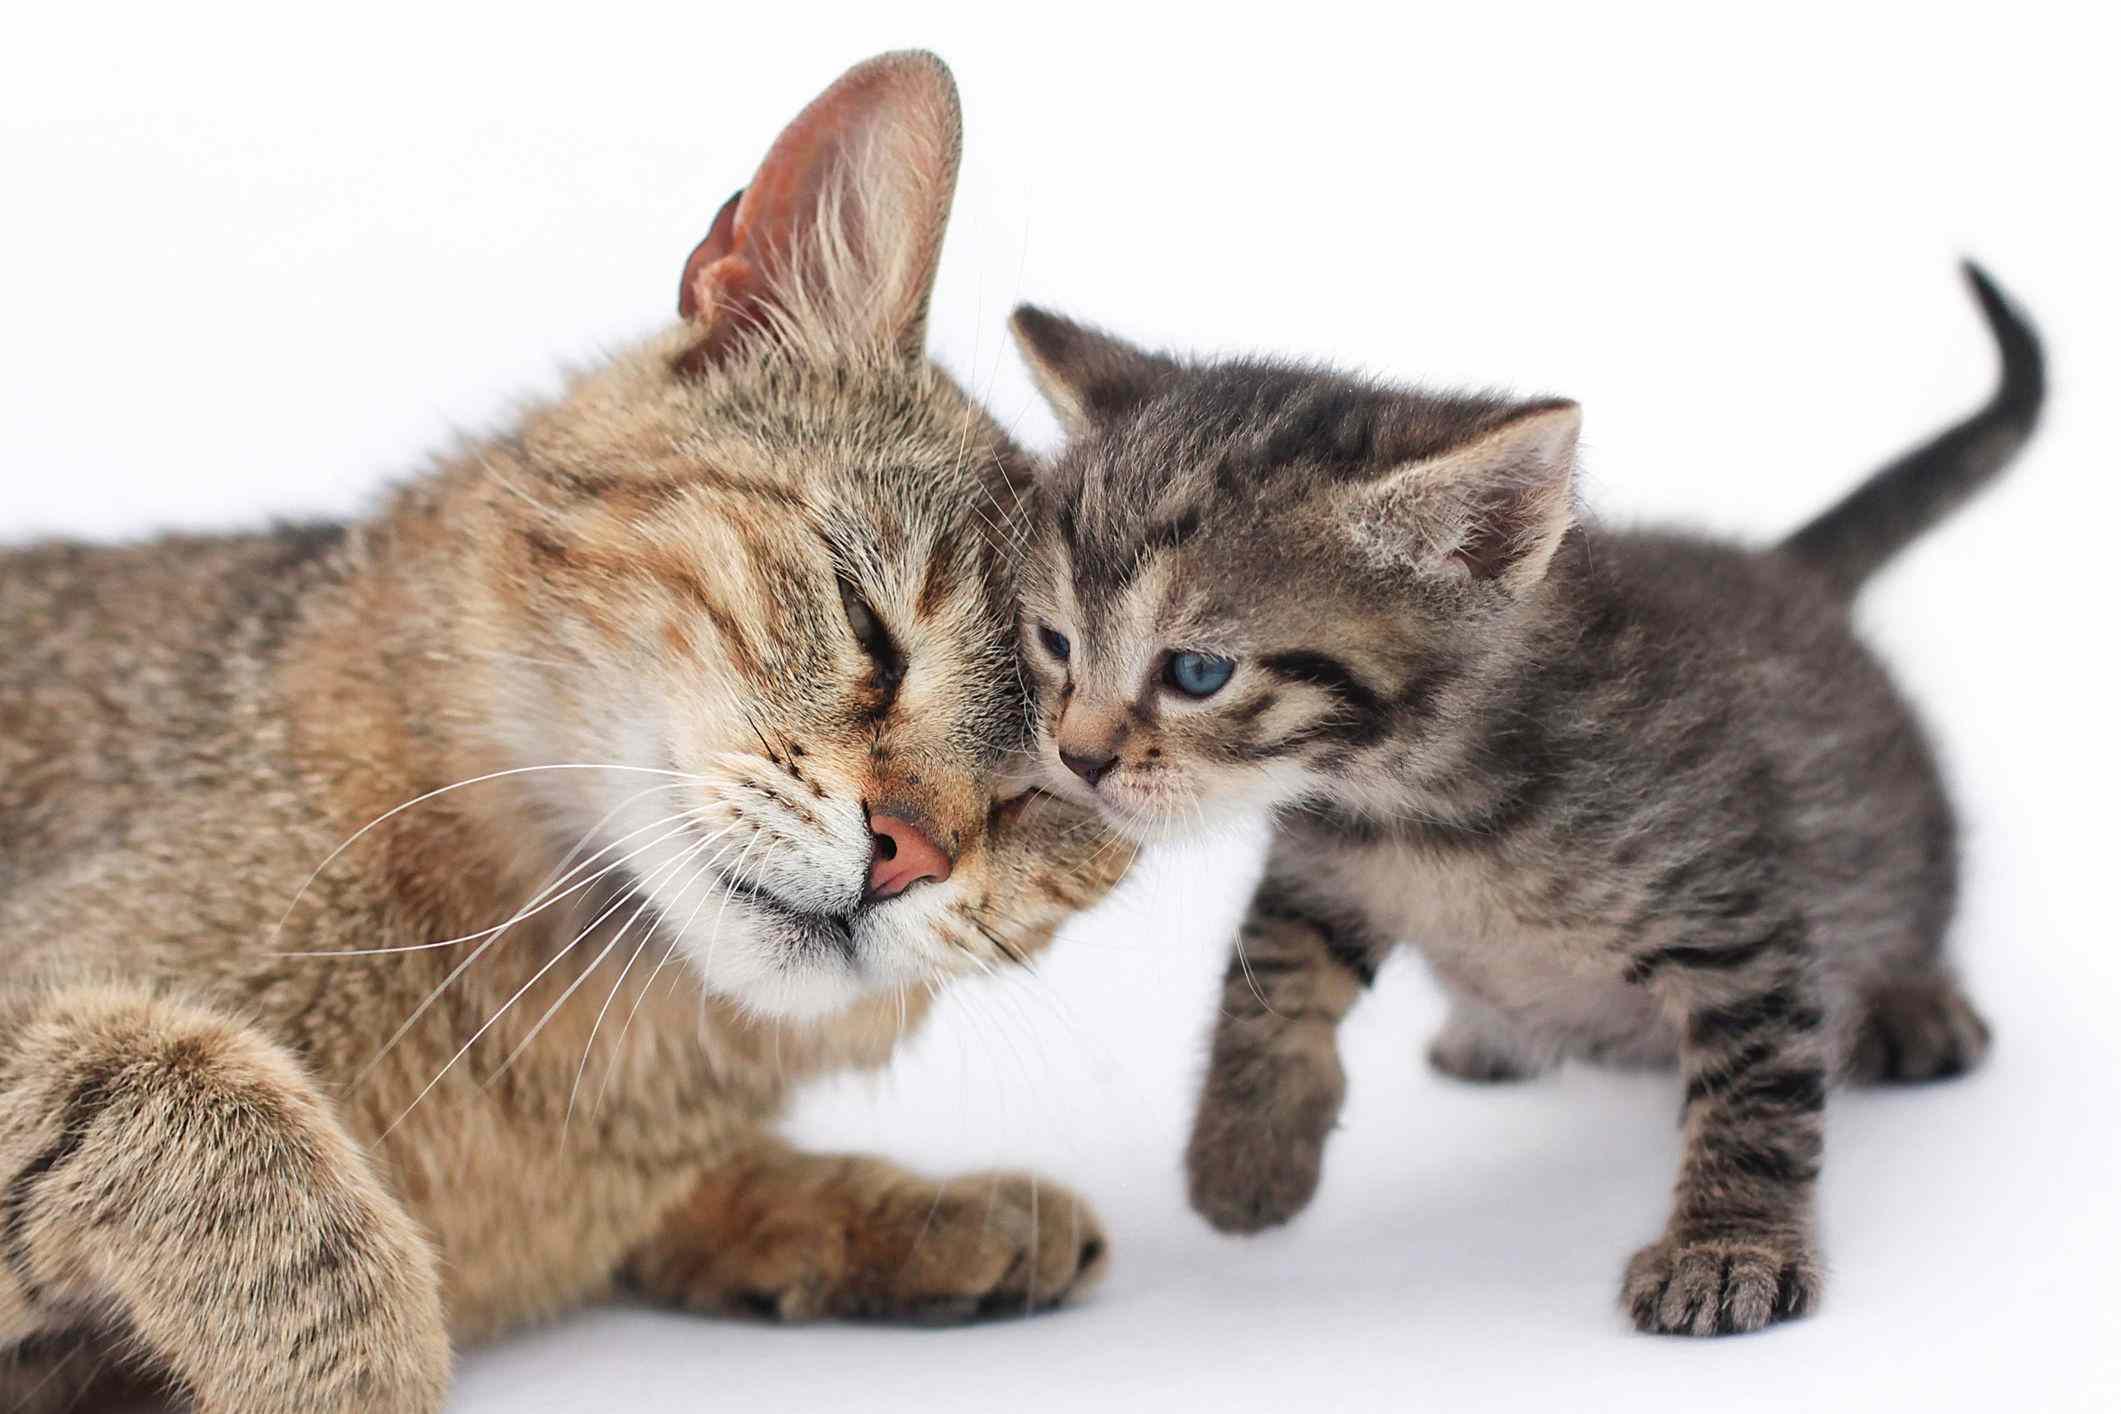 Gata madre acariciando a un gatito pequeño